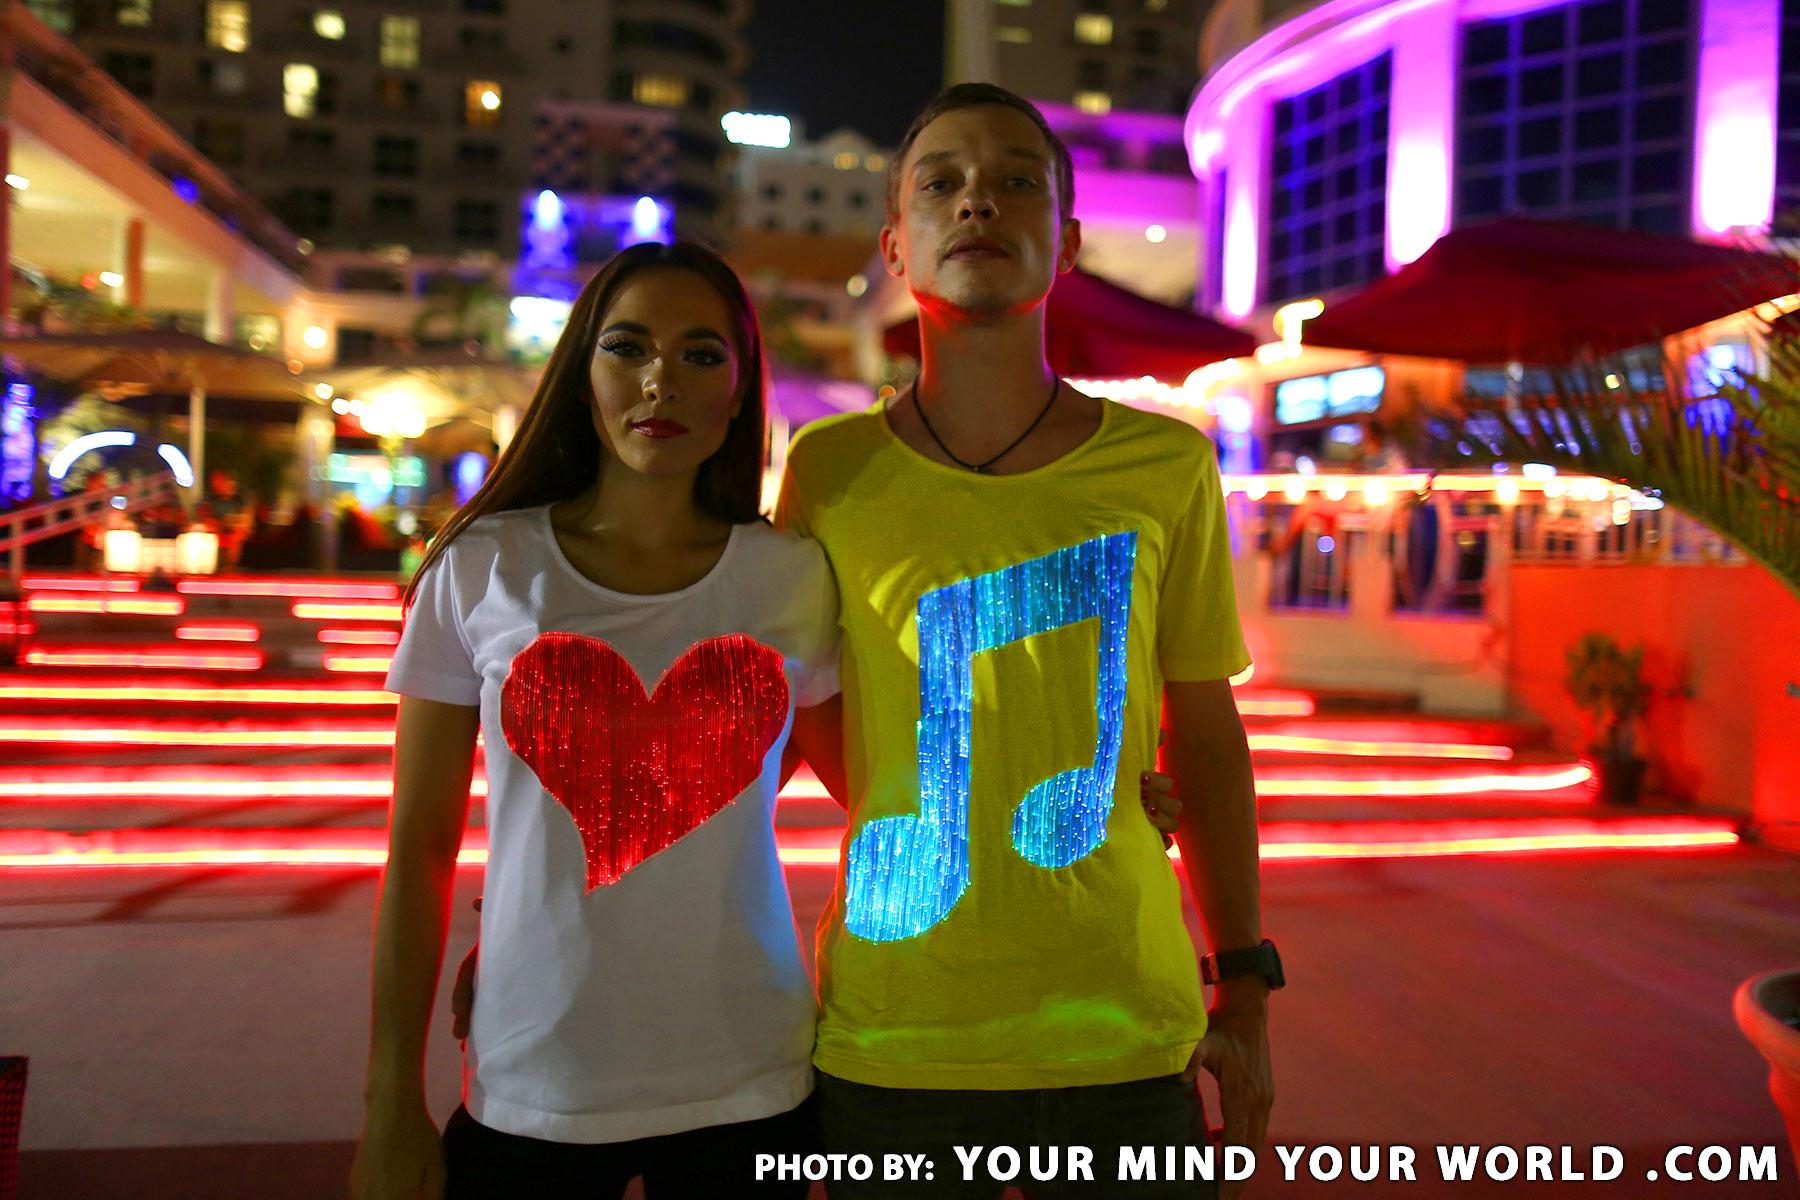 Mens light up edm music cool glow t shirt uu6KSZOP